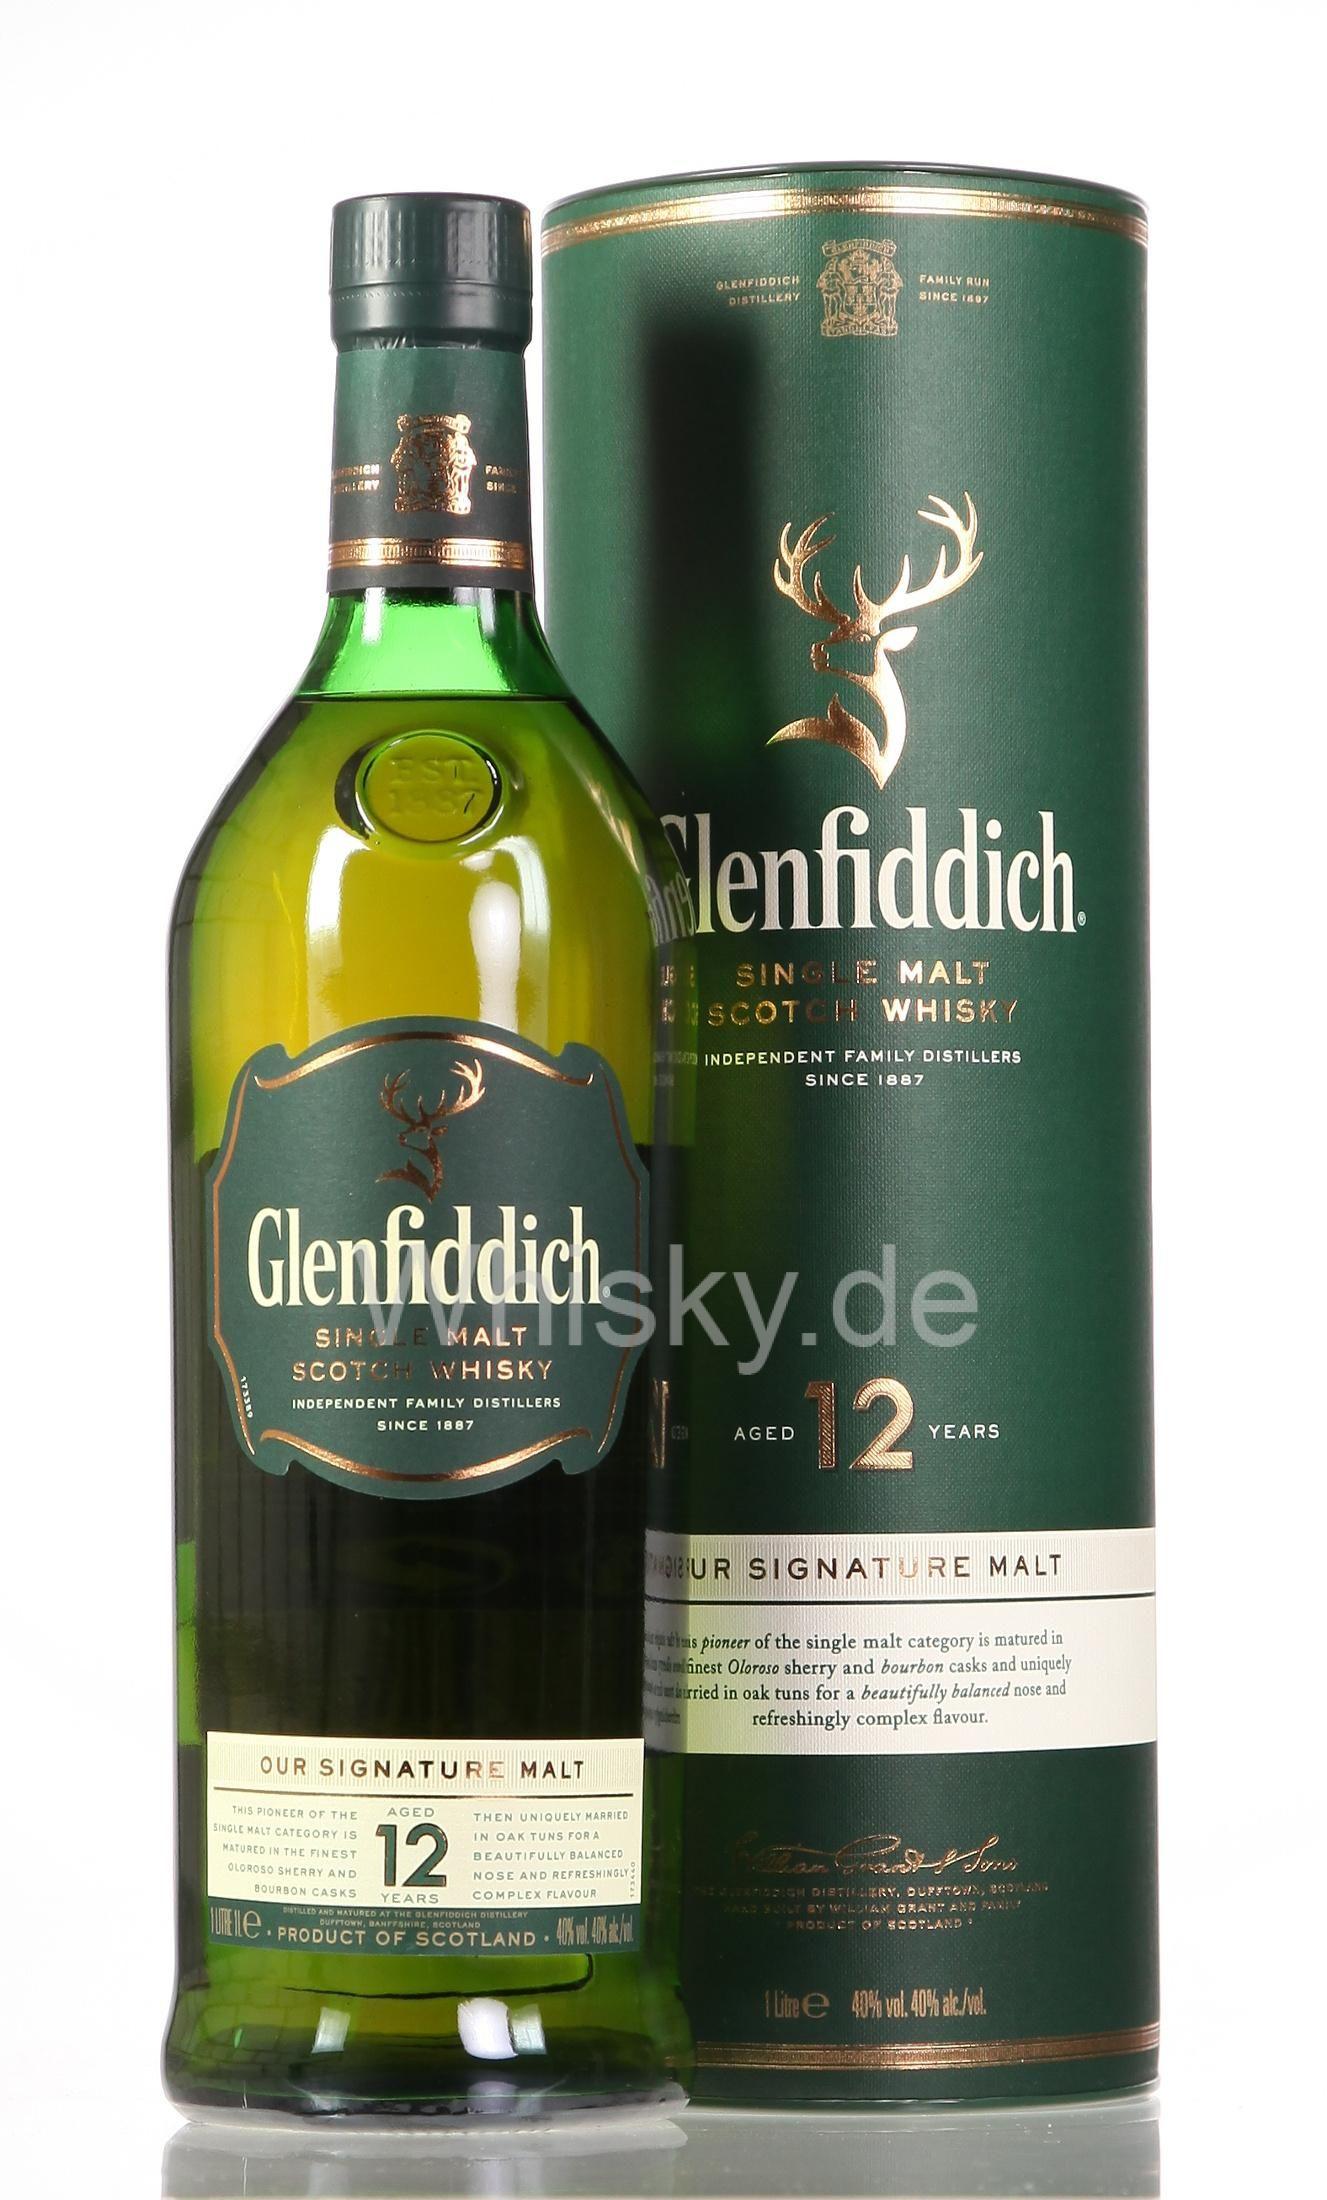 Glenfiddich 12 Jahre Single Malt Whisky (Prime) oder ab Montag bei real,-